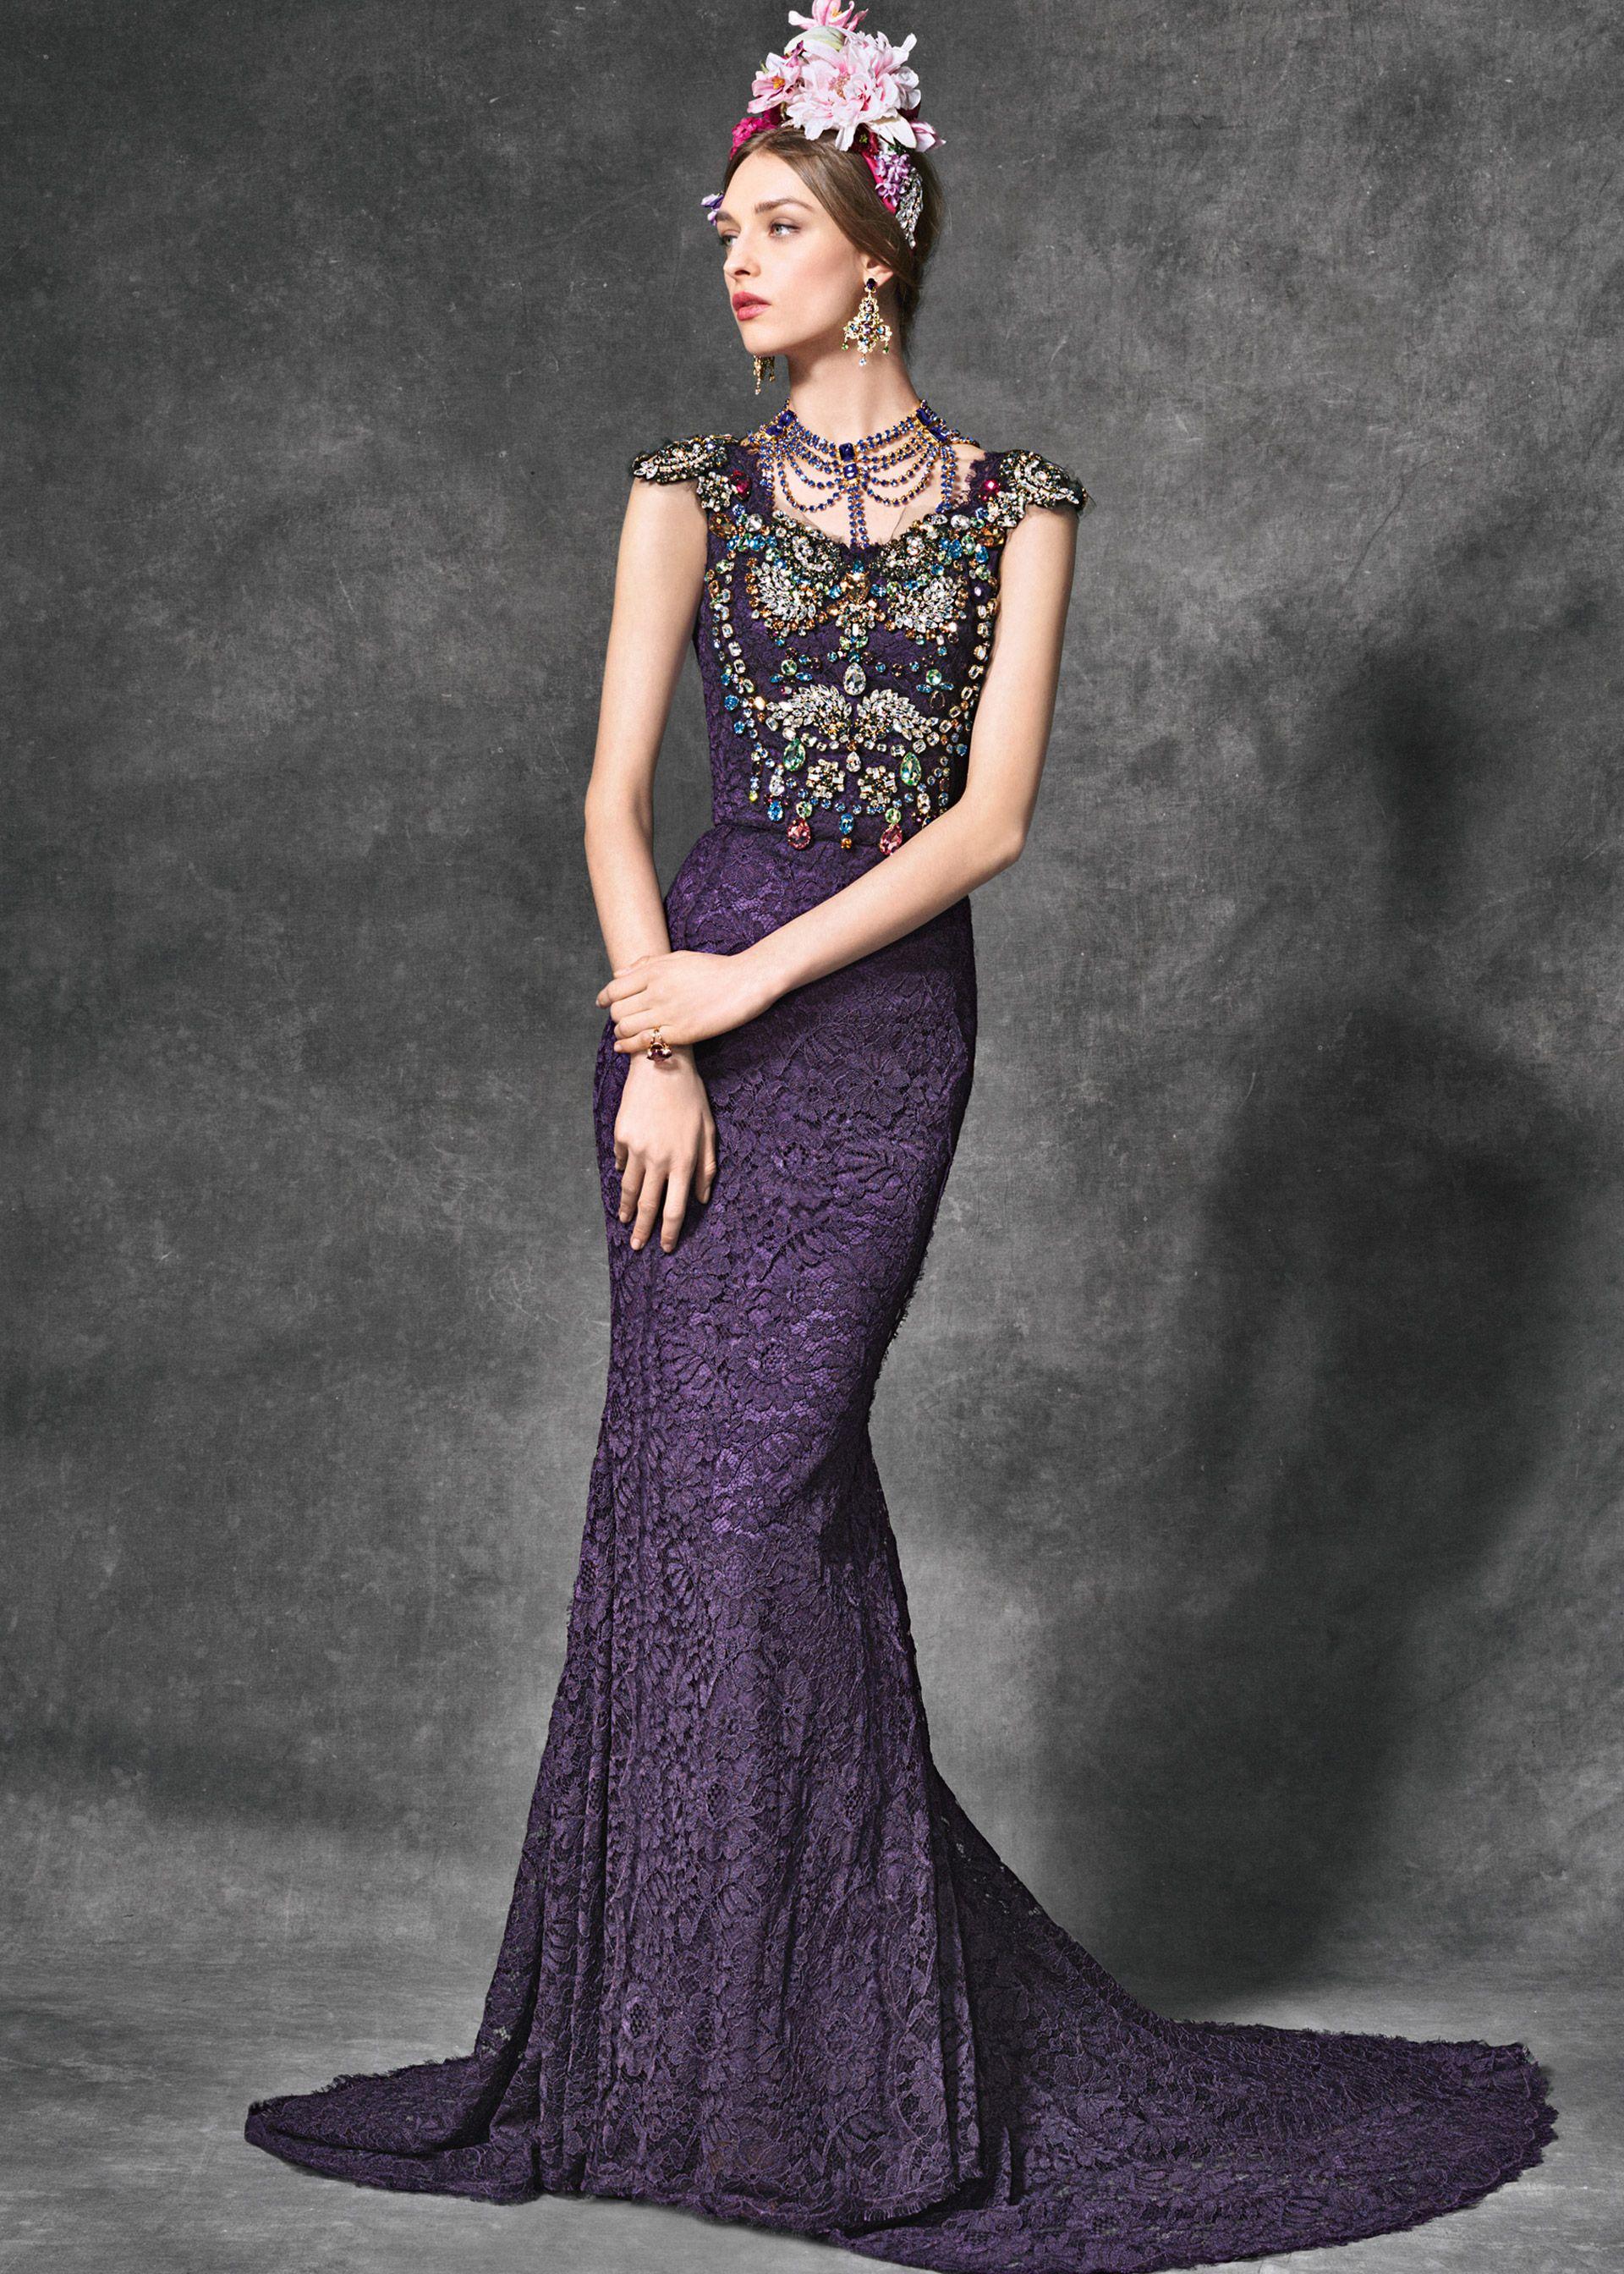 Dolce and gabbana wedding dresses 2018 wedding dresses for Dolce and gabbana wedding dresses